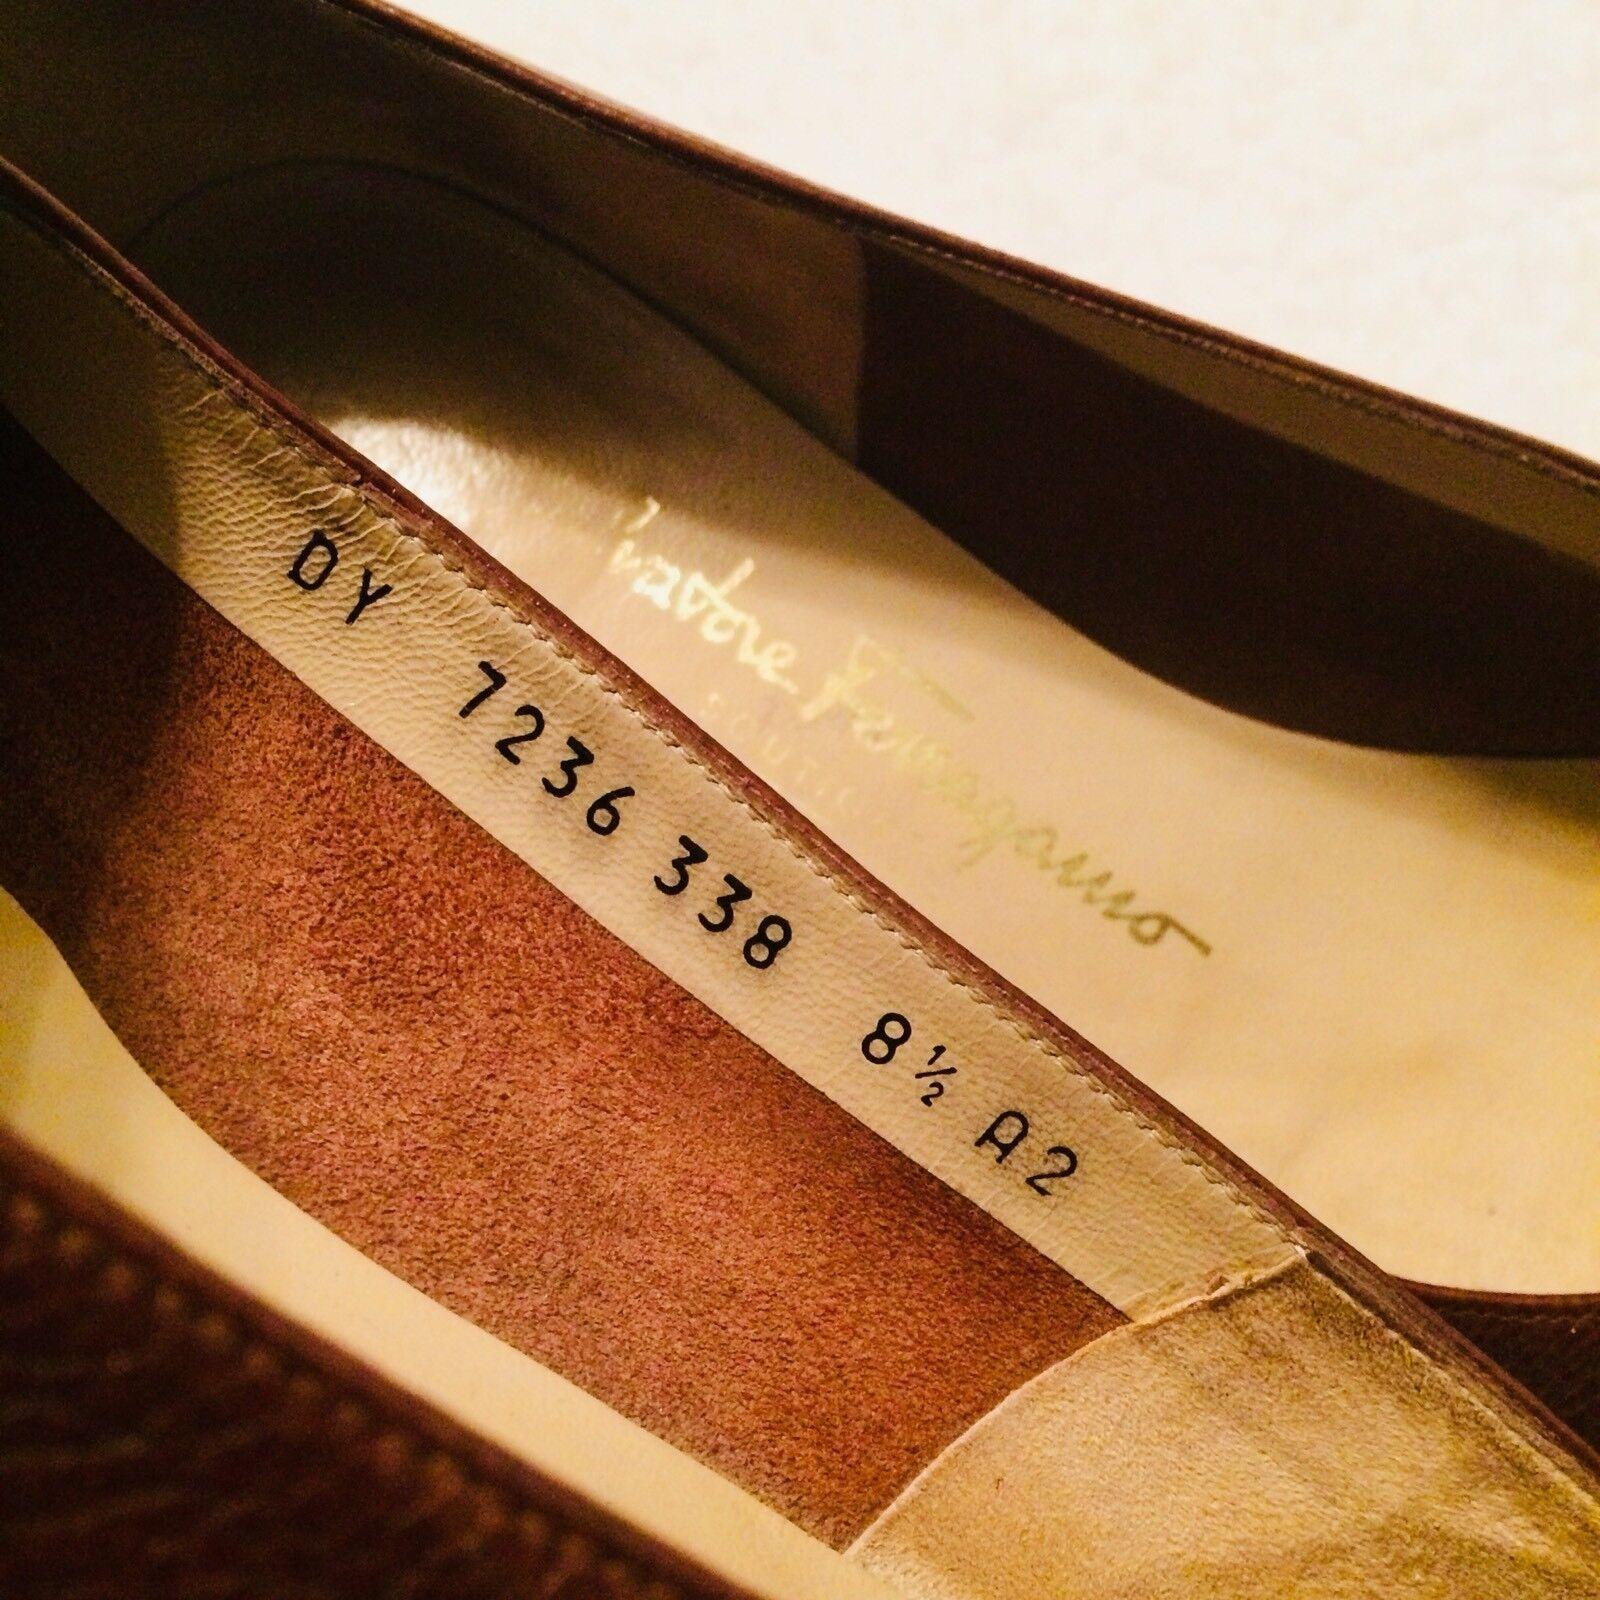 Salvatore Ferragamo 7236 338 R 8.5 8.5 8.5 A2 Slip on leather schuhe.. Very nice d0e422